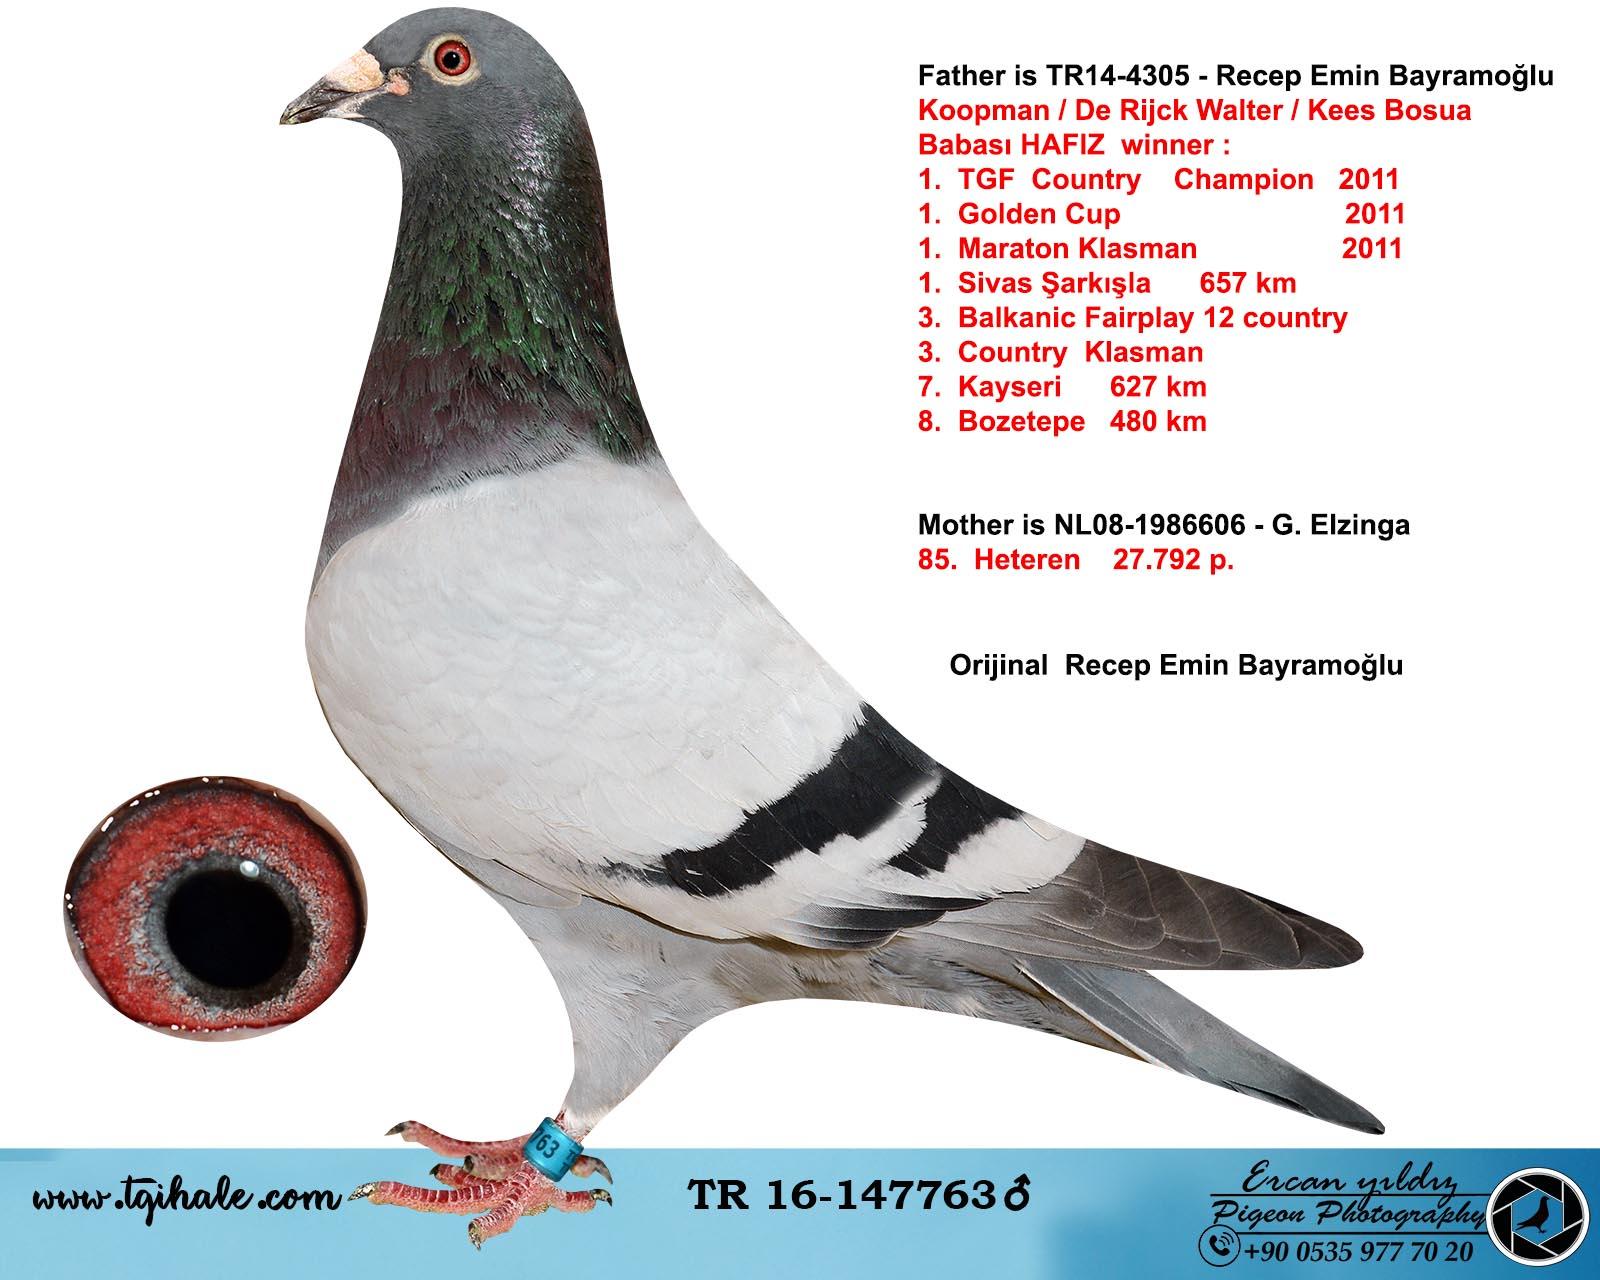 TR16-147763 ERKEK / BABASI KOOPMAN - R. WALTER - K. BOSUA ANNESİ 85. HETEREN